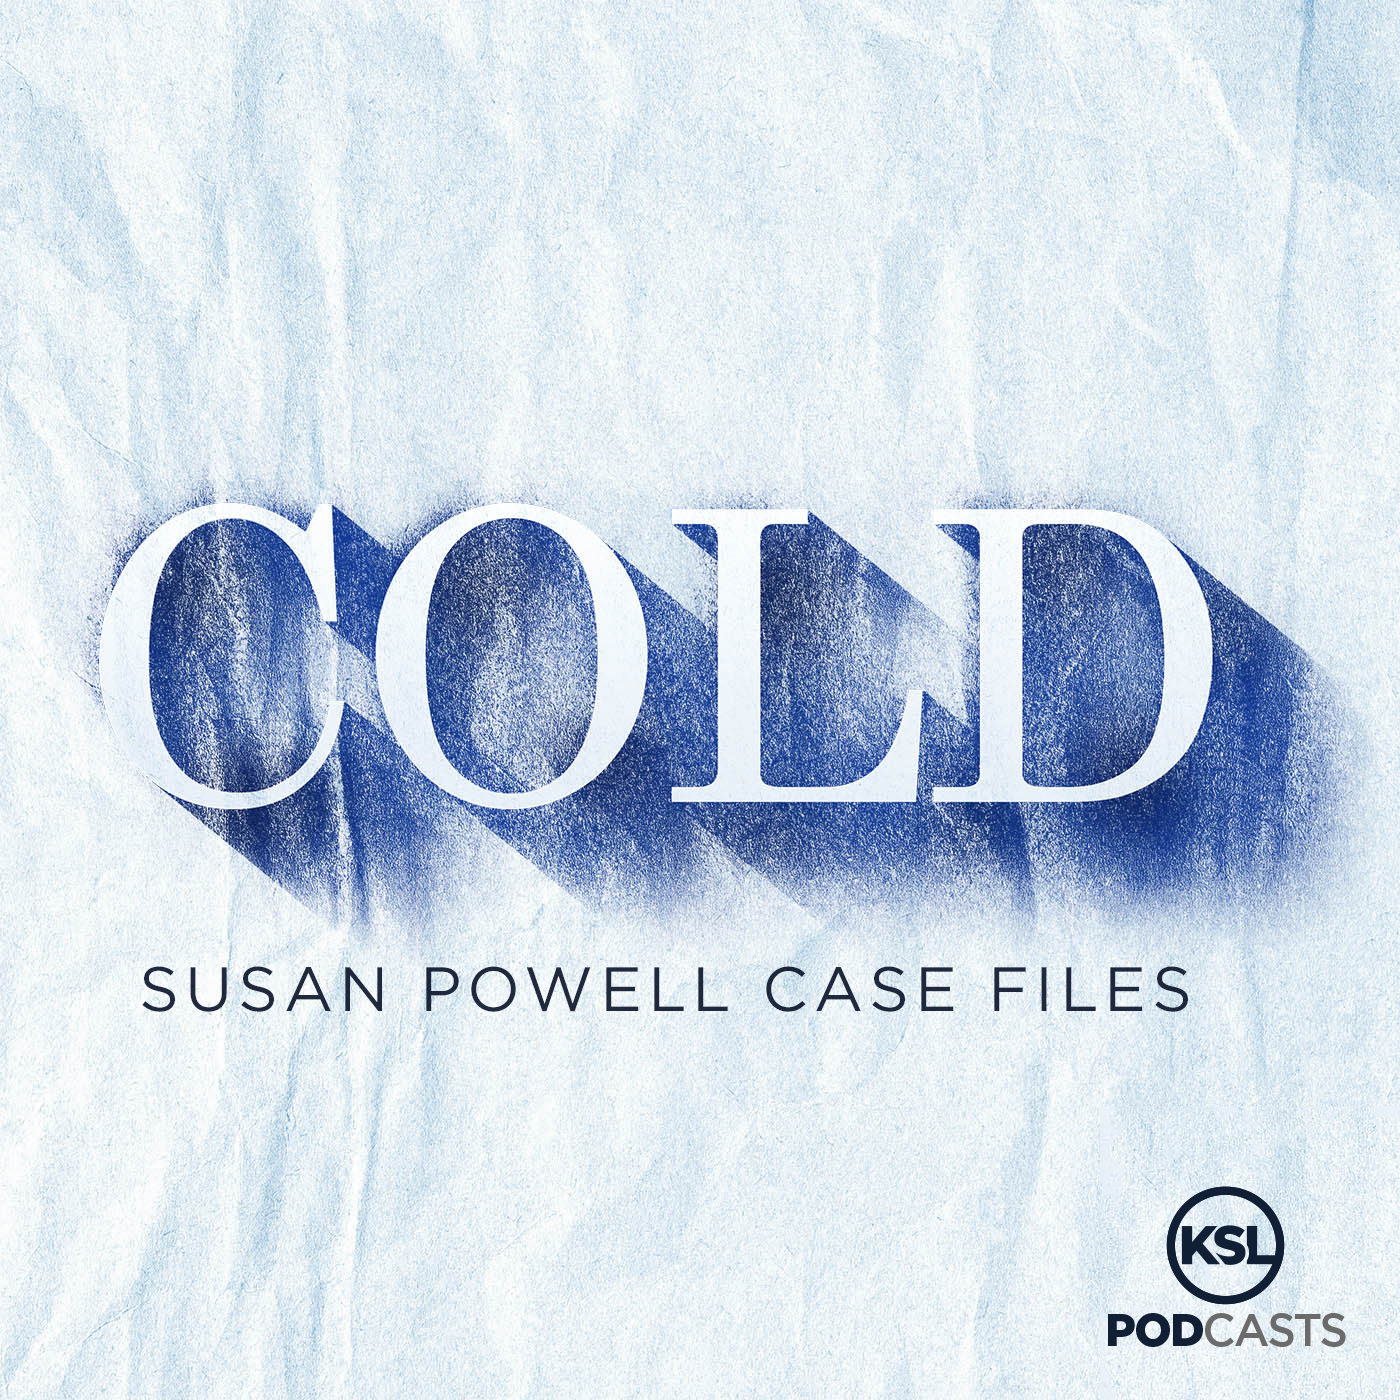 Ep. 17: Cold Case